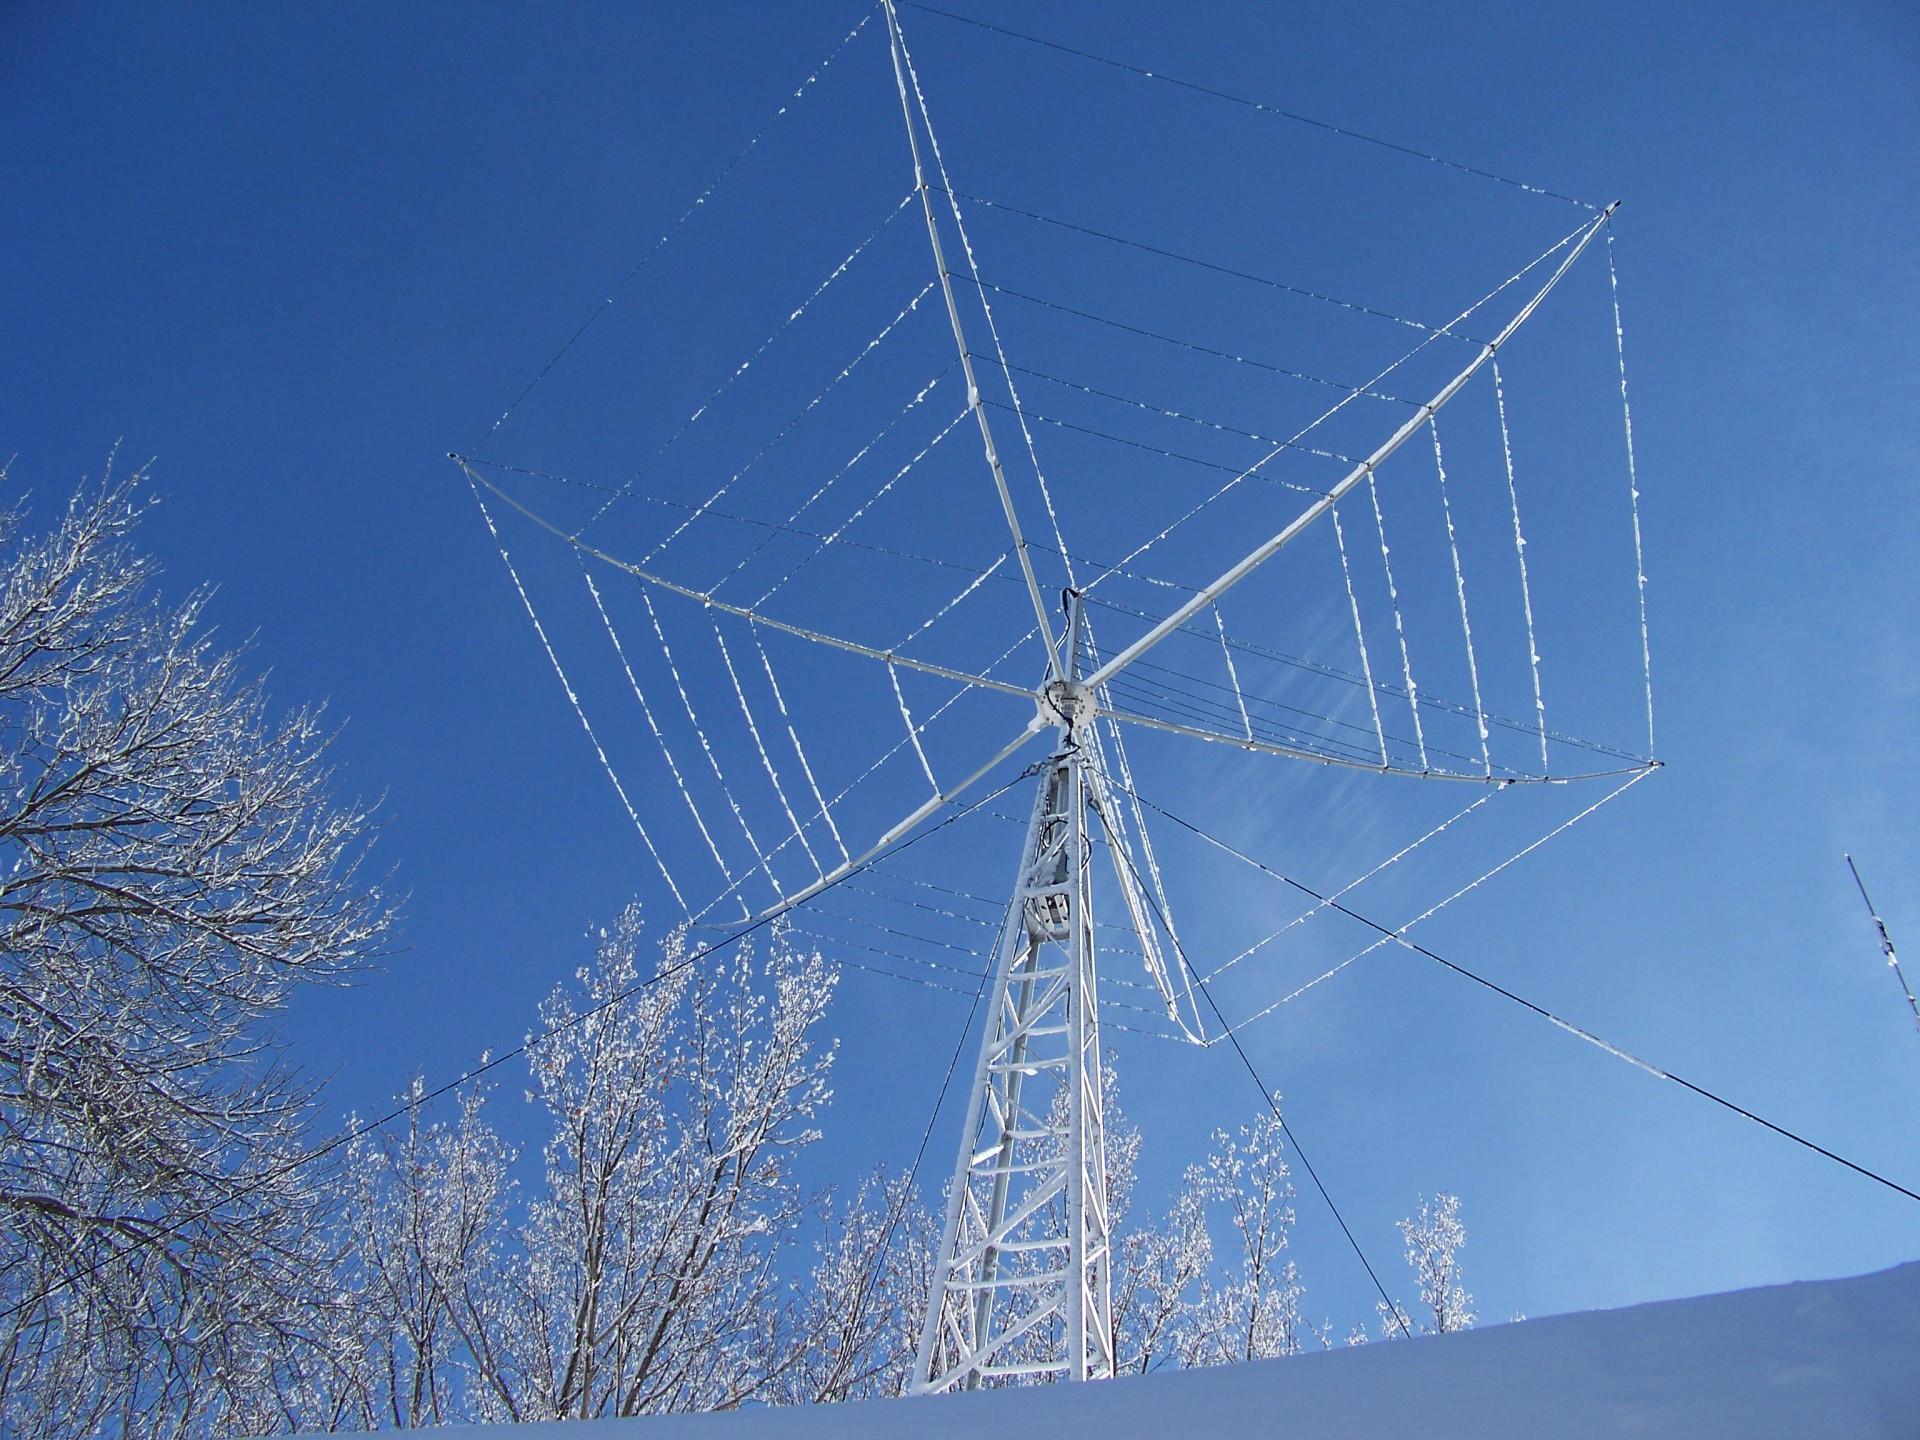 Ice on the beam